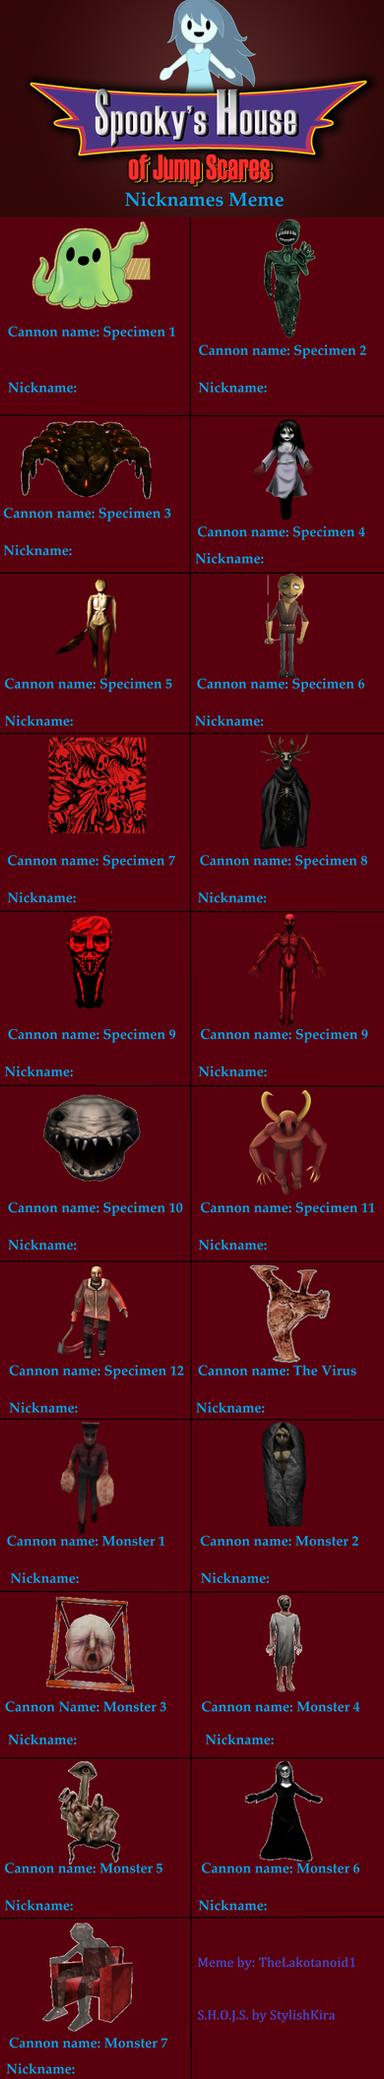 Spooky's House of Jump Scares Nickname Meme by thelakotanoid1